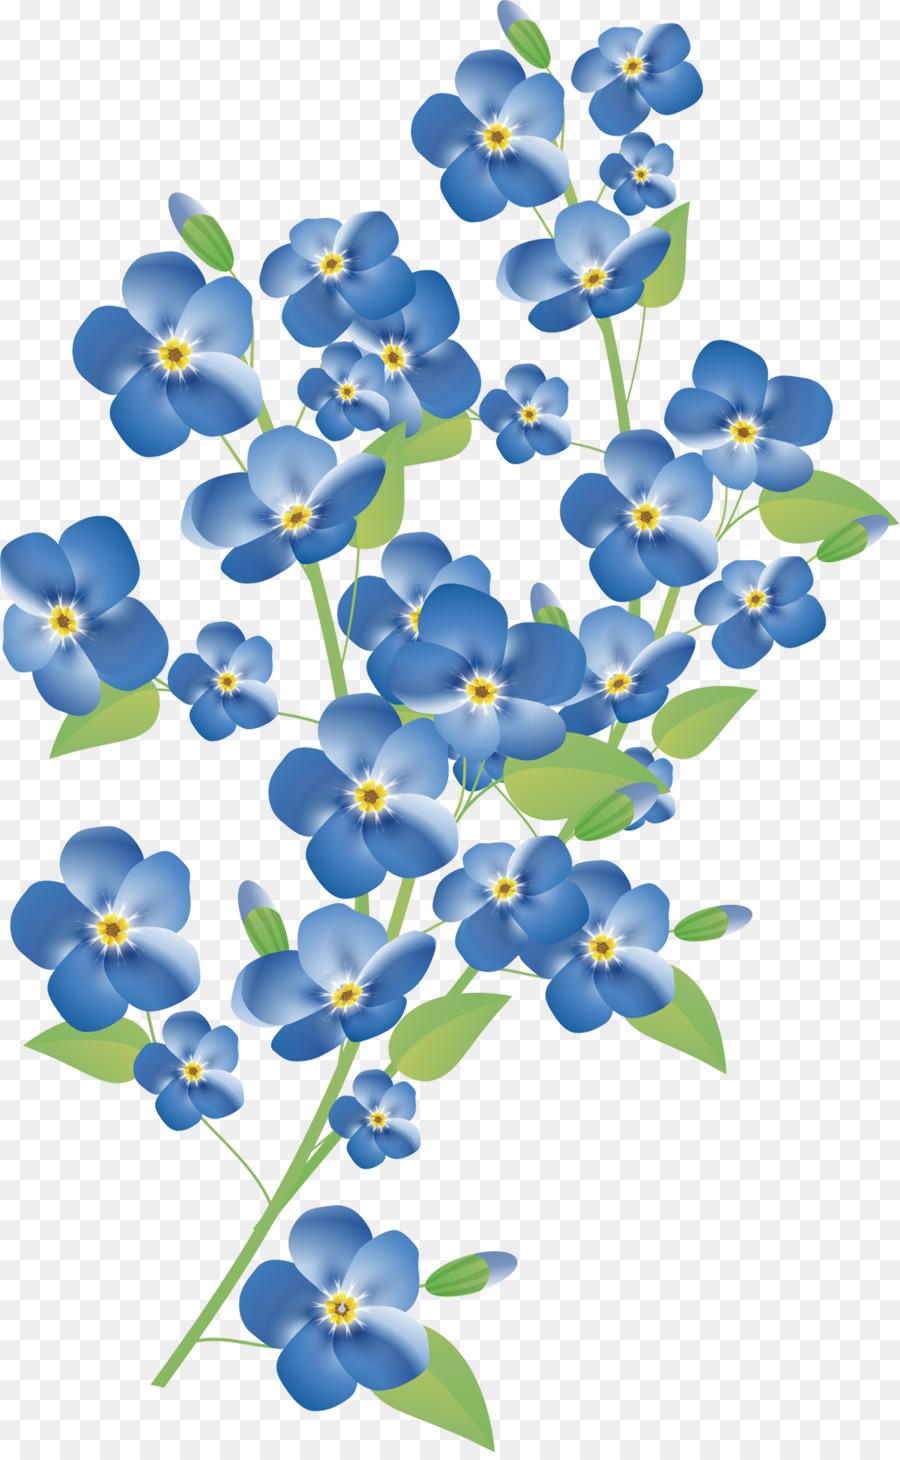 Blue, Flower, Plant, transparent png image & clipart free download.